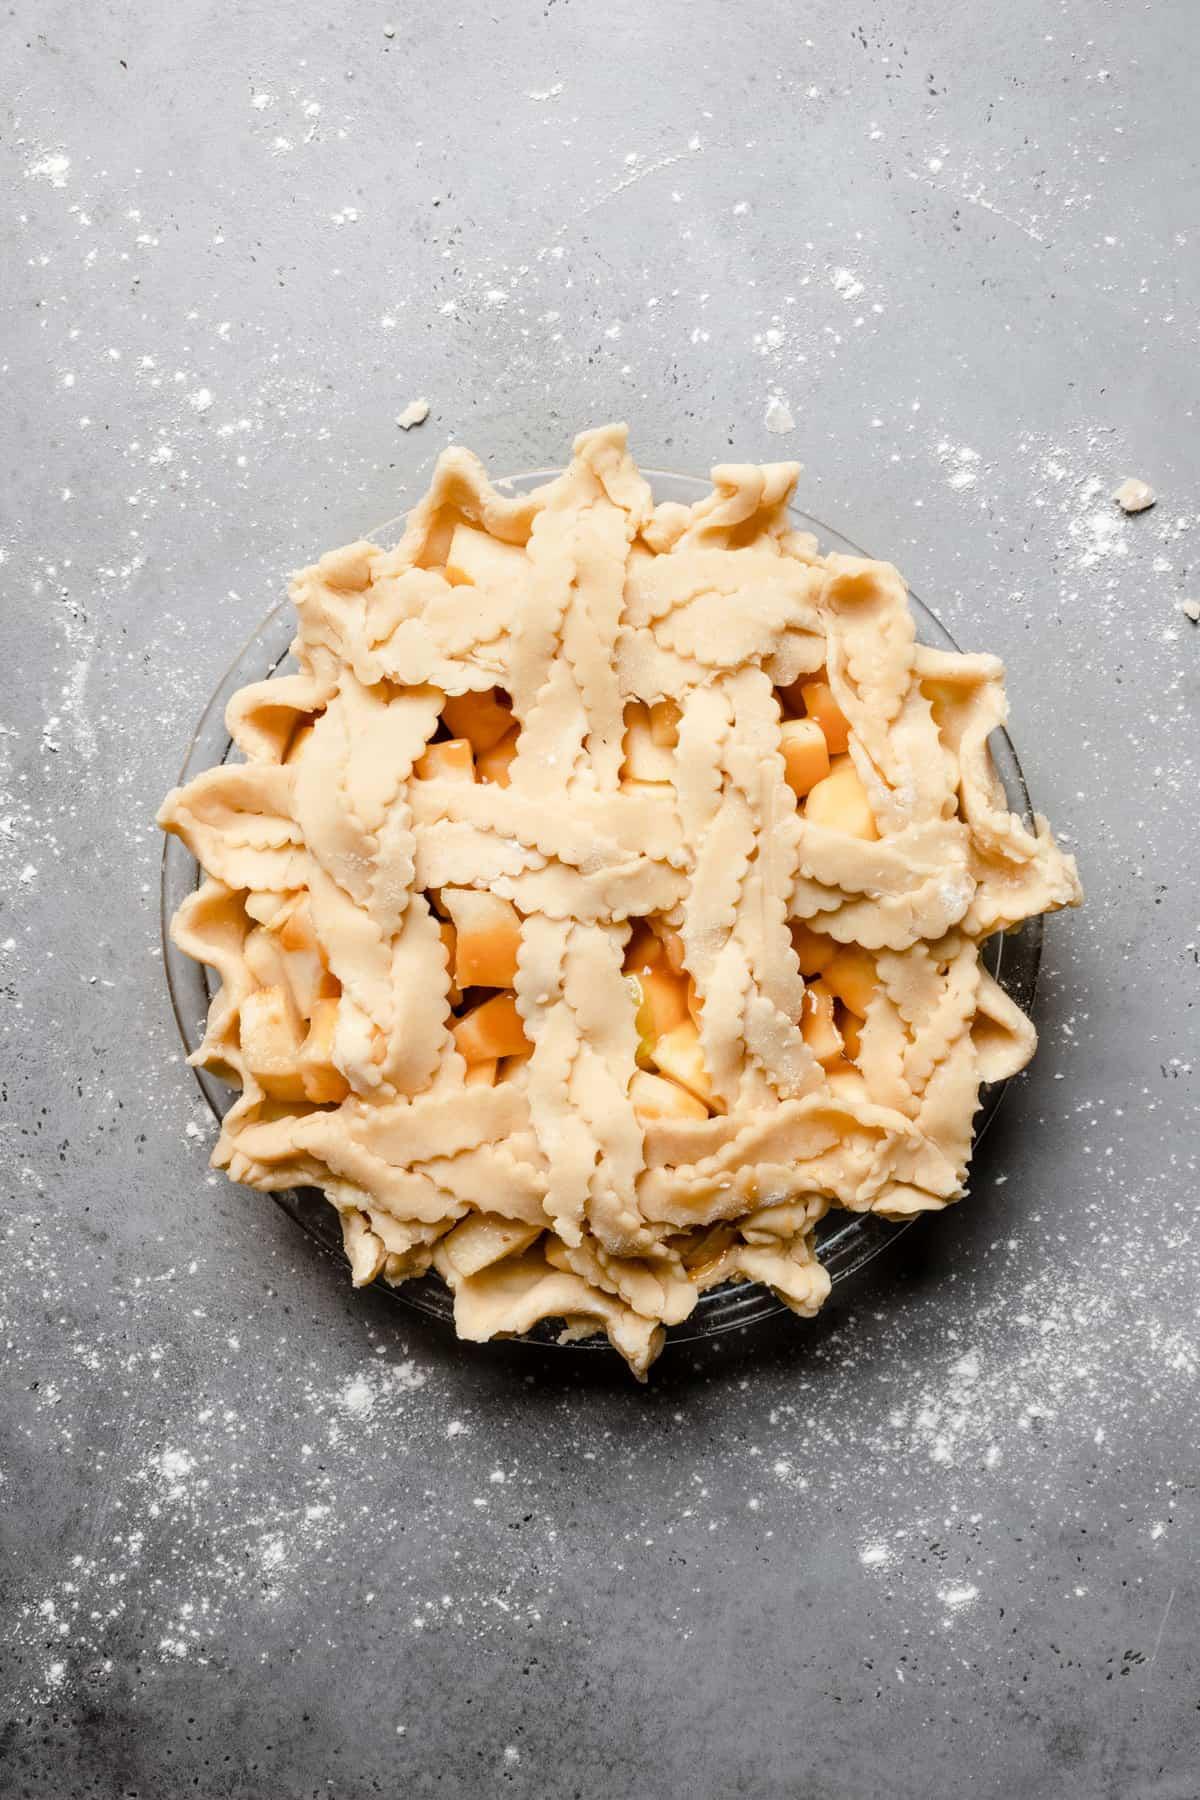 Pie pie with caramel sauce